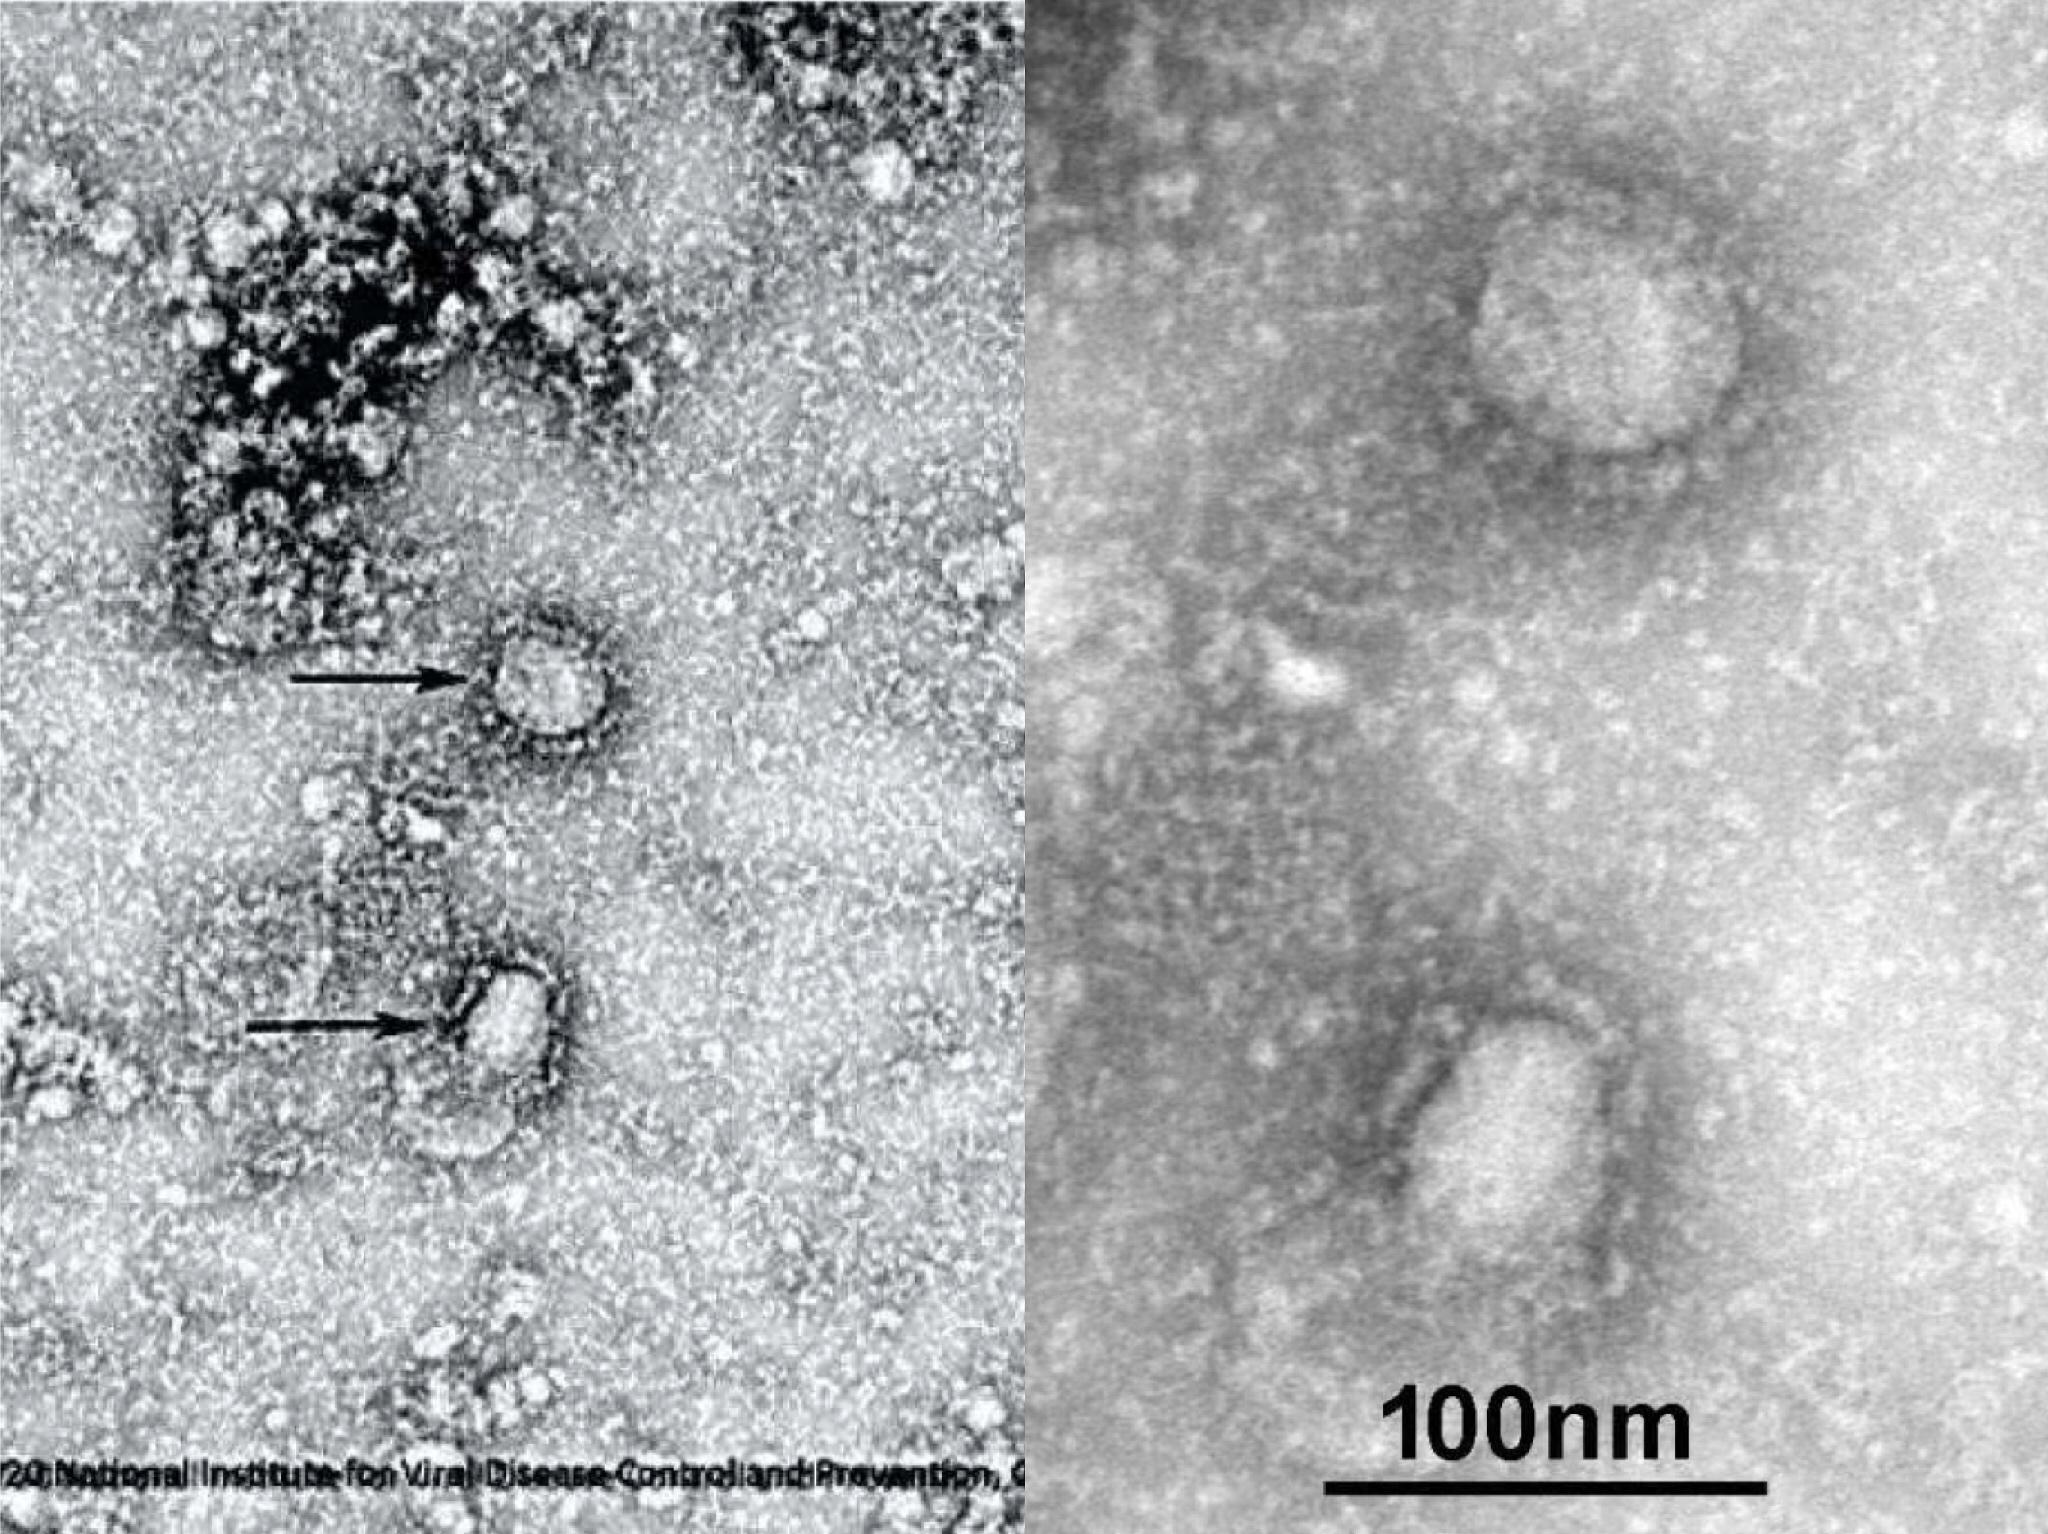 Chinese researchers publish early findings about novel coronavirus